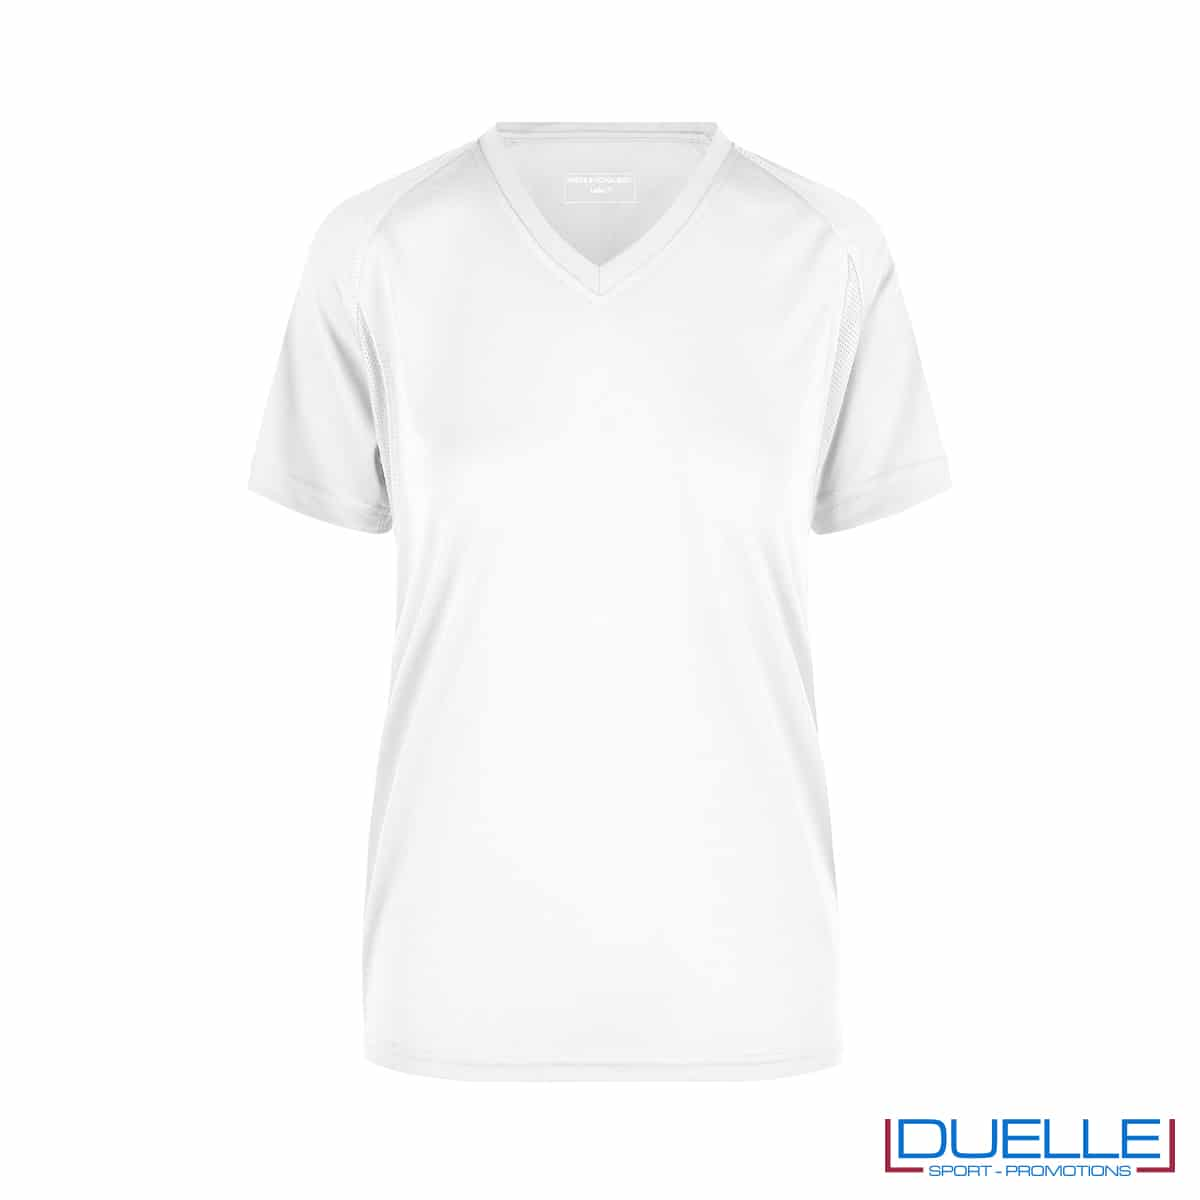 T-shirt running donna personalizzata colore bianco